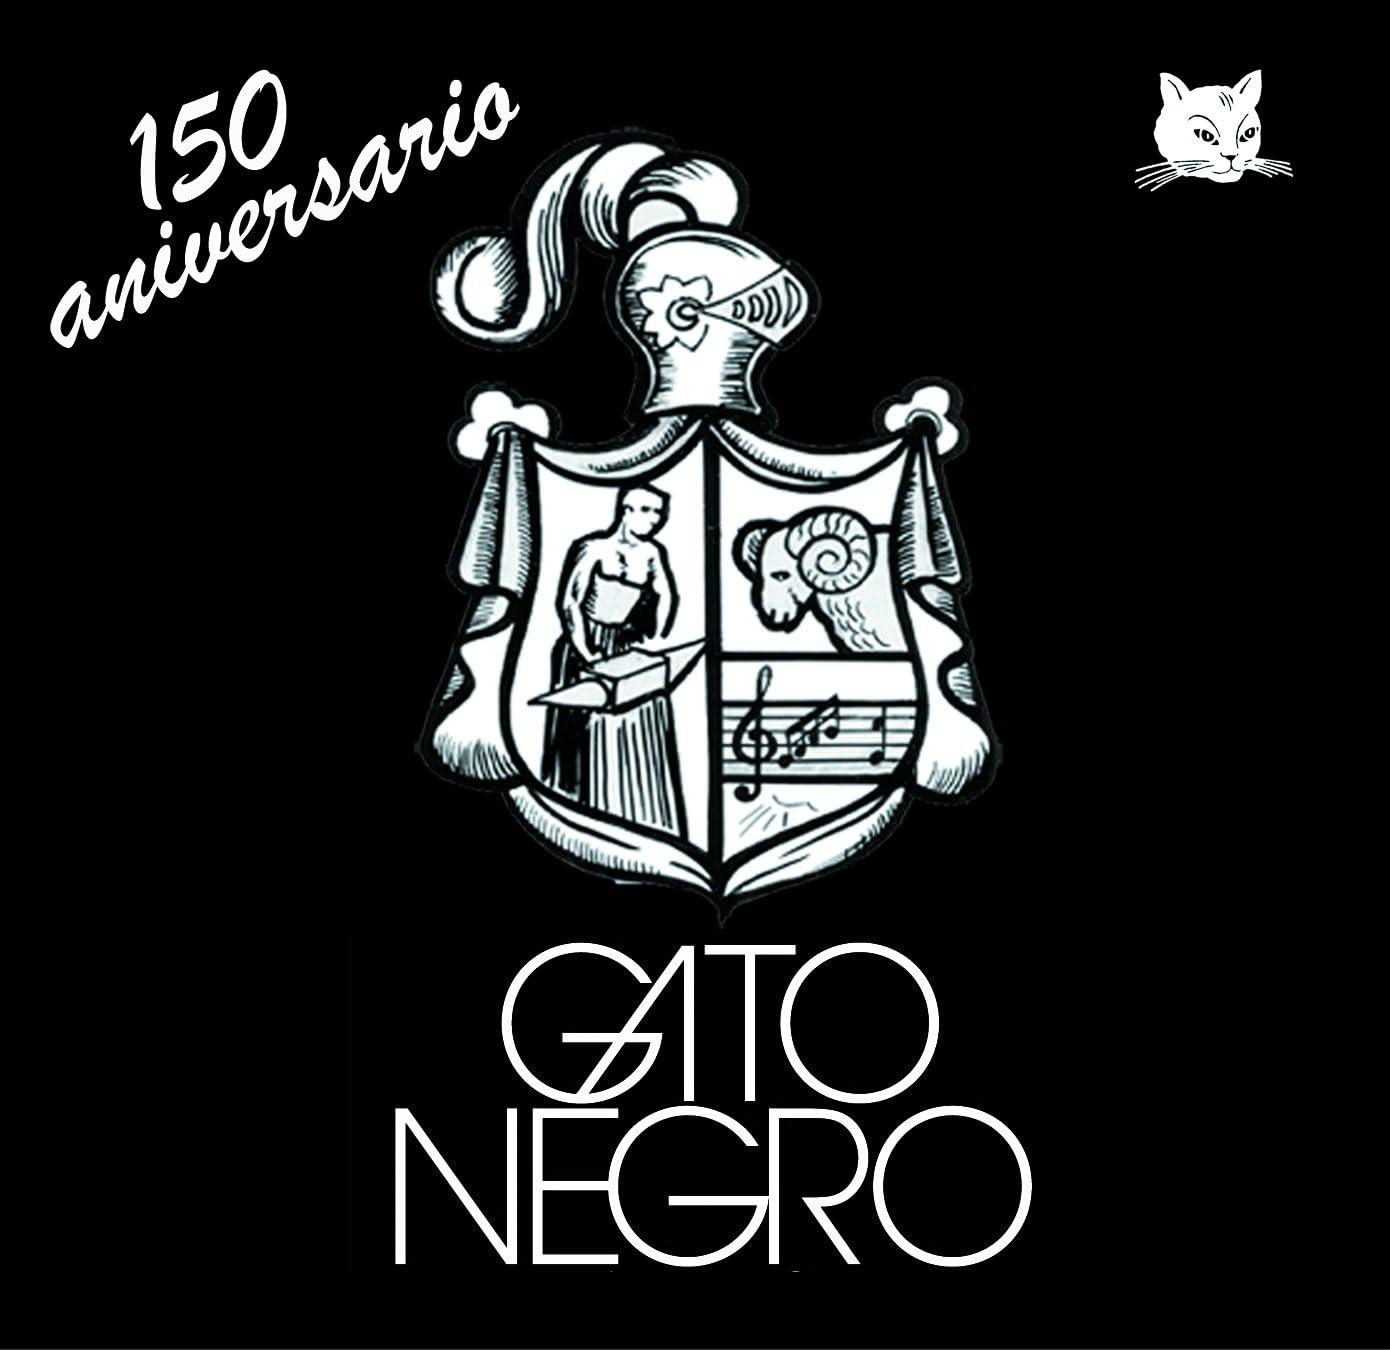 Juego de cuerdas Gato Negro 150 Aniversario para guitarra clásica.